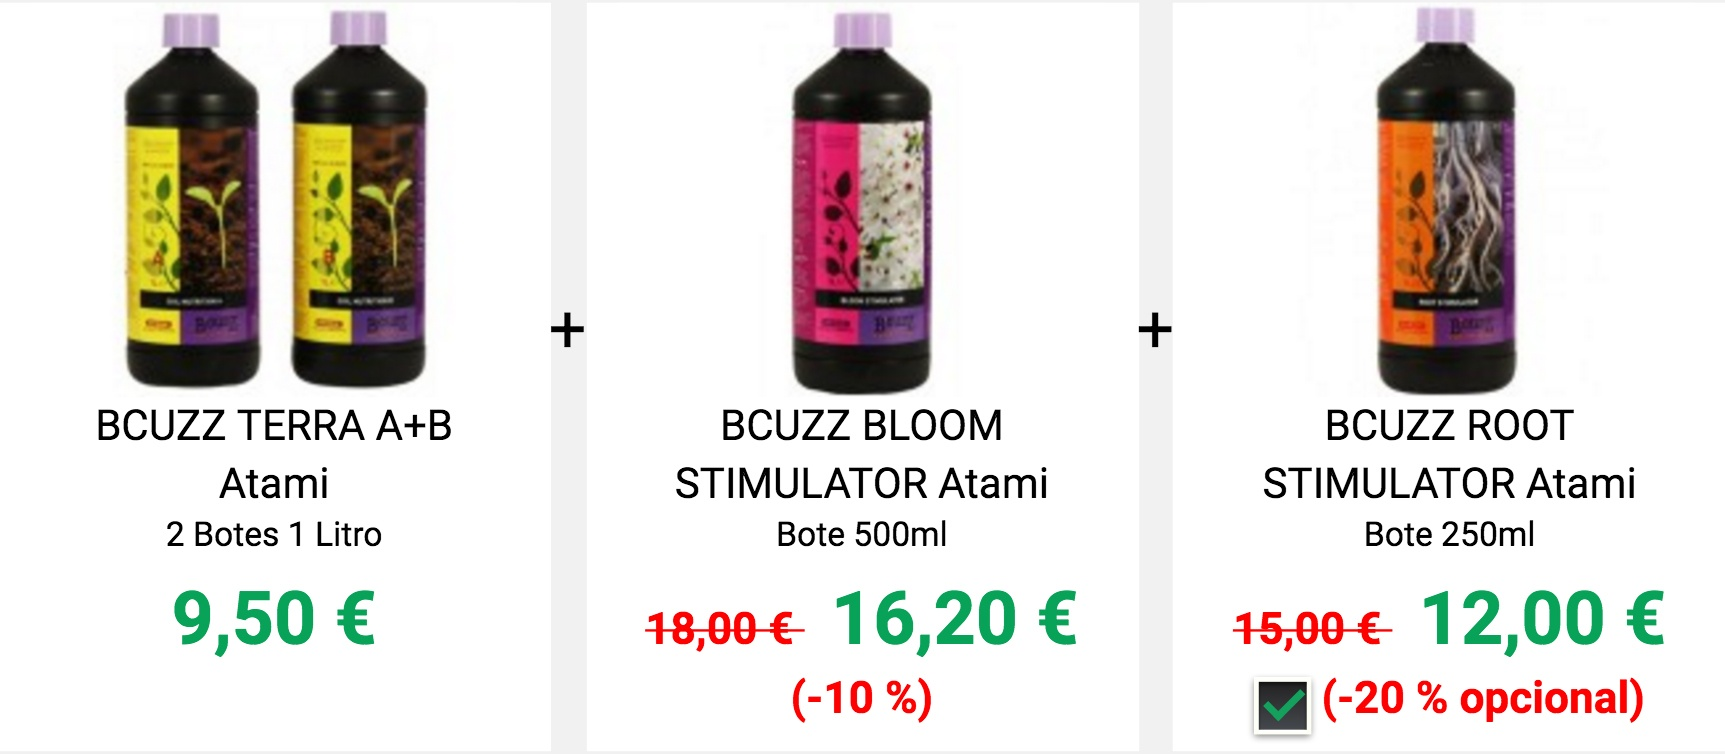 oferta-bcuzz-terra